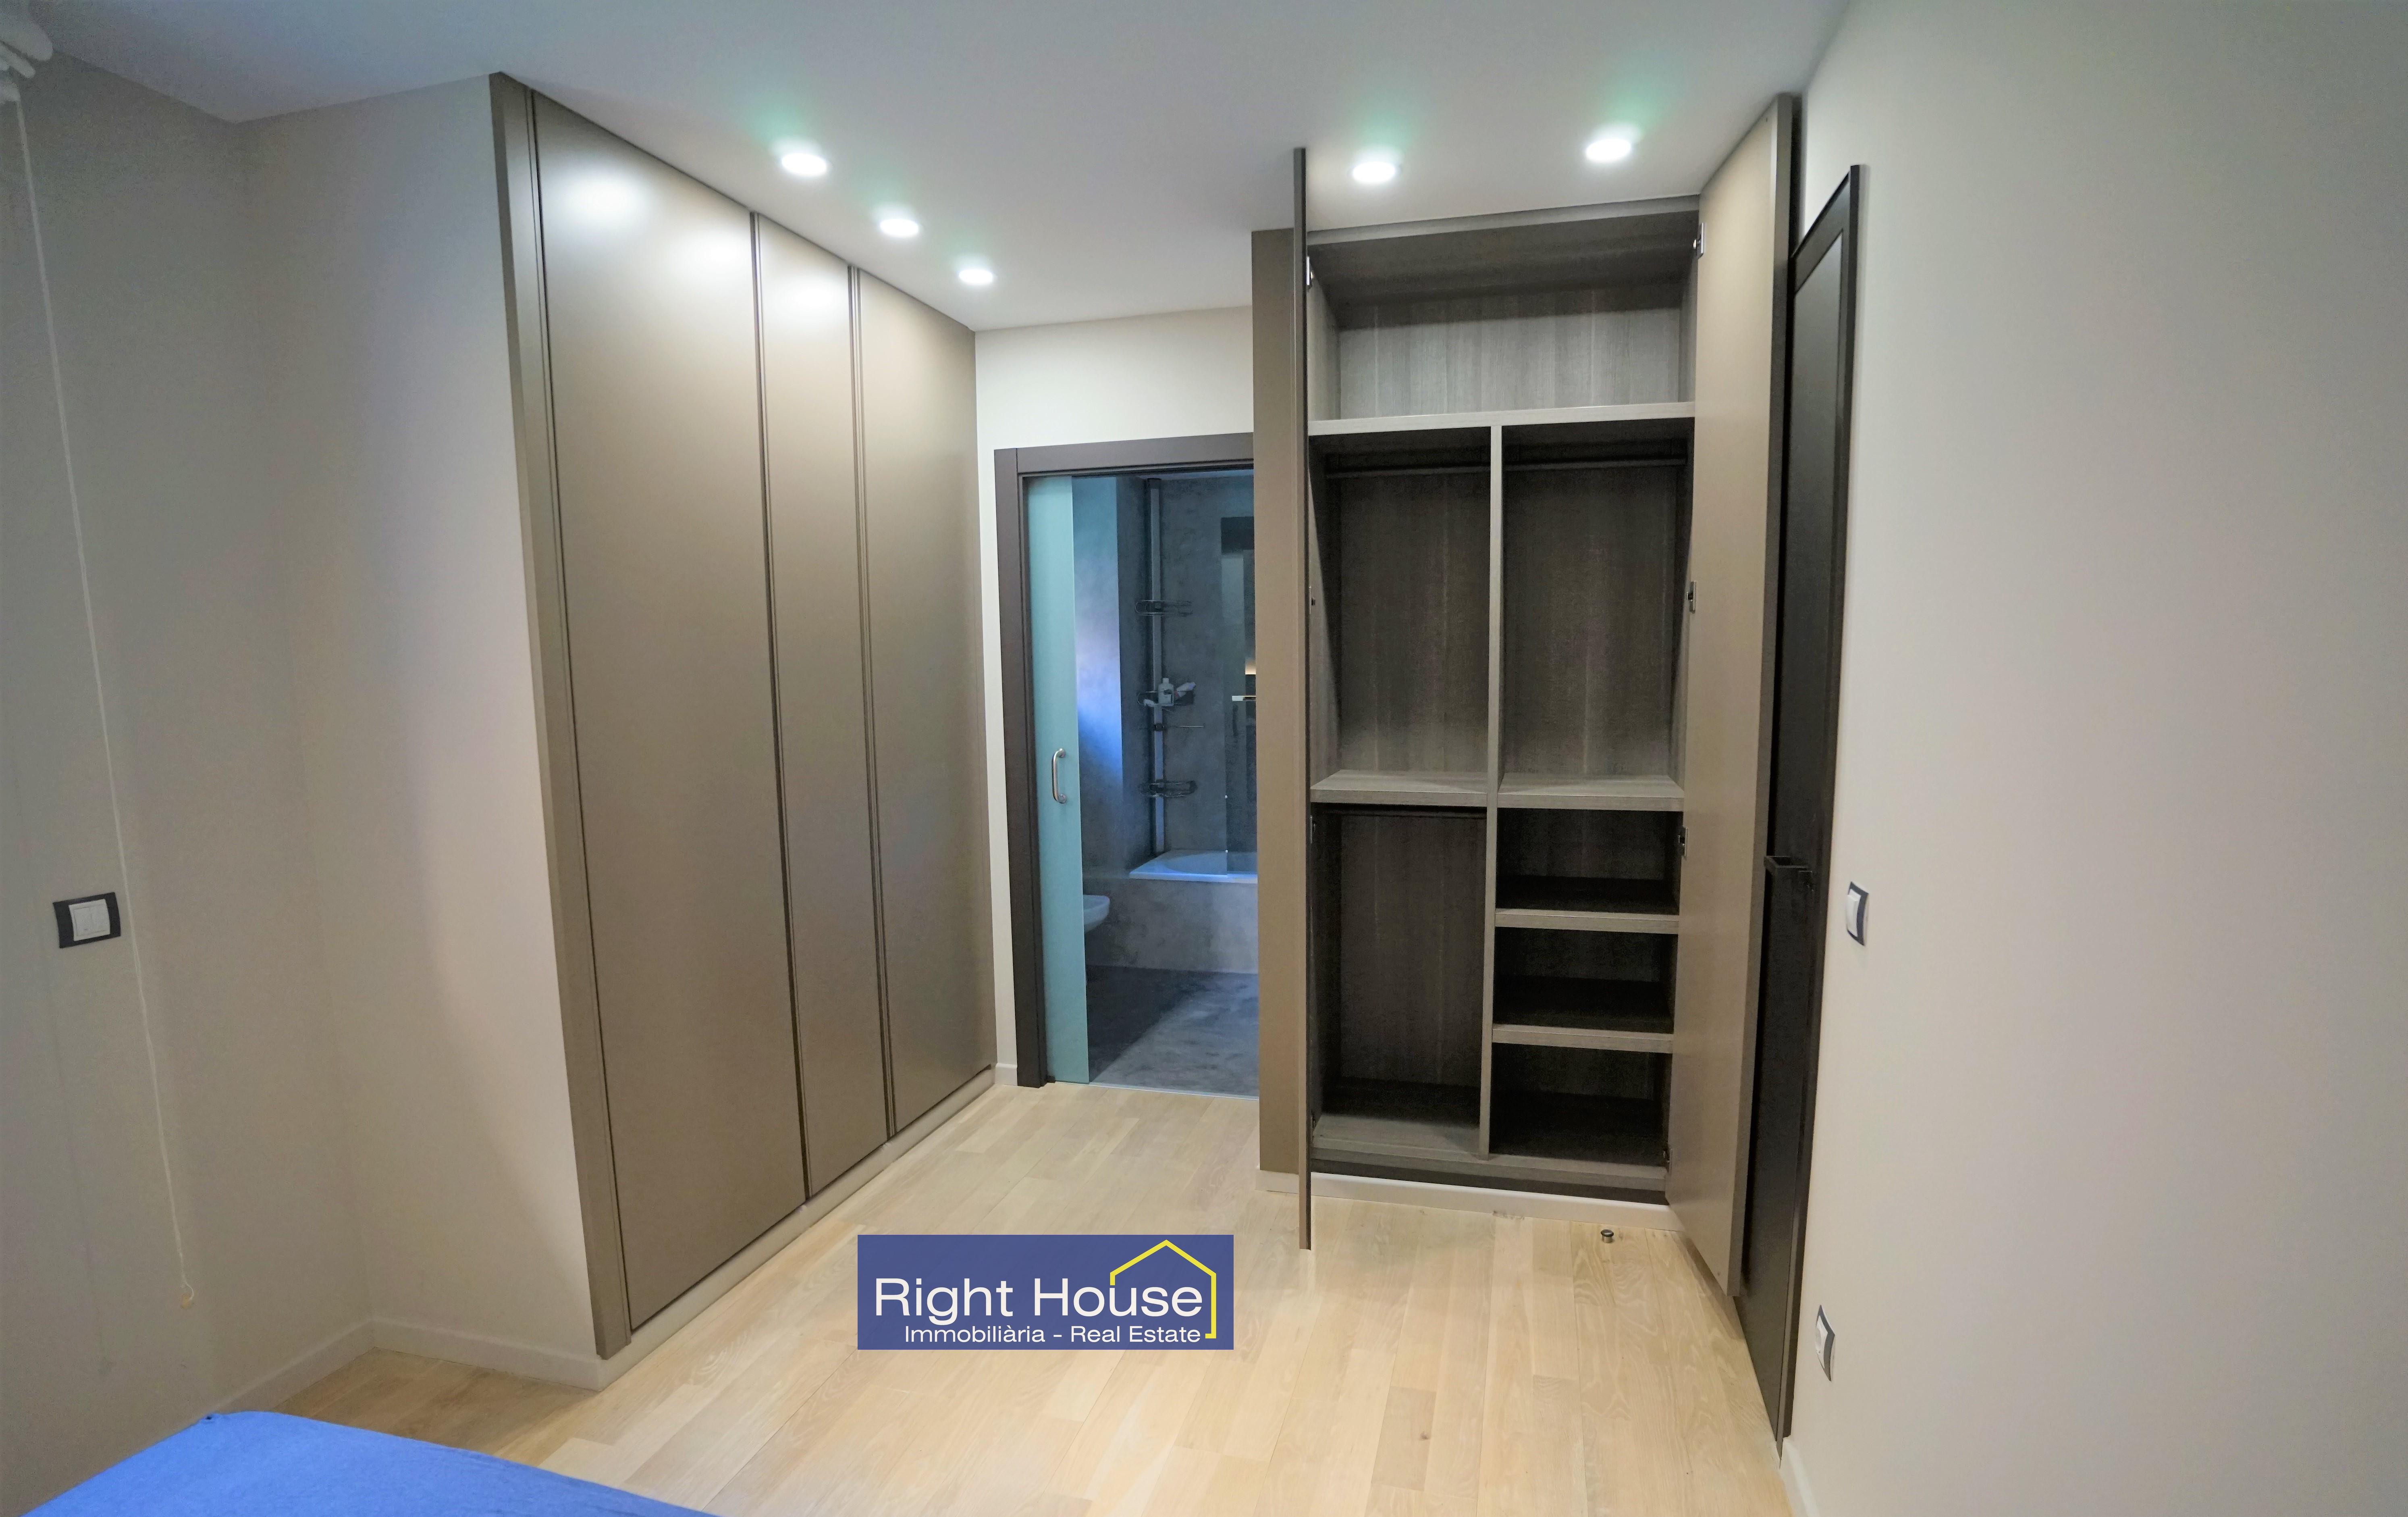 Pis en venda a Ordino, 3 habitacions, 112 metres